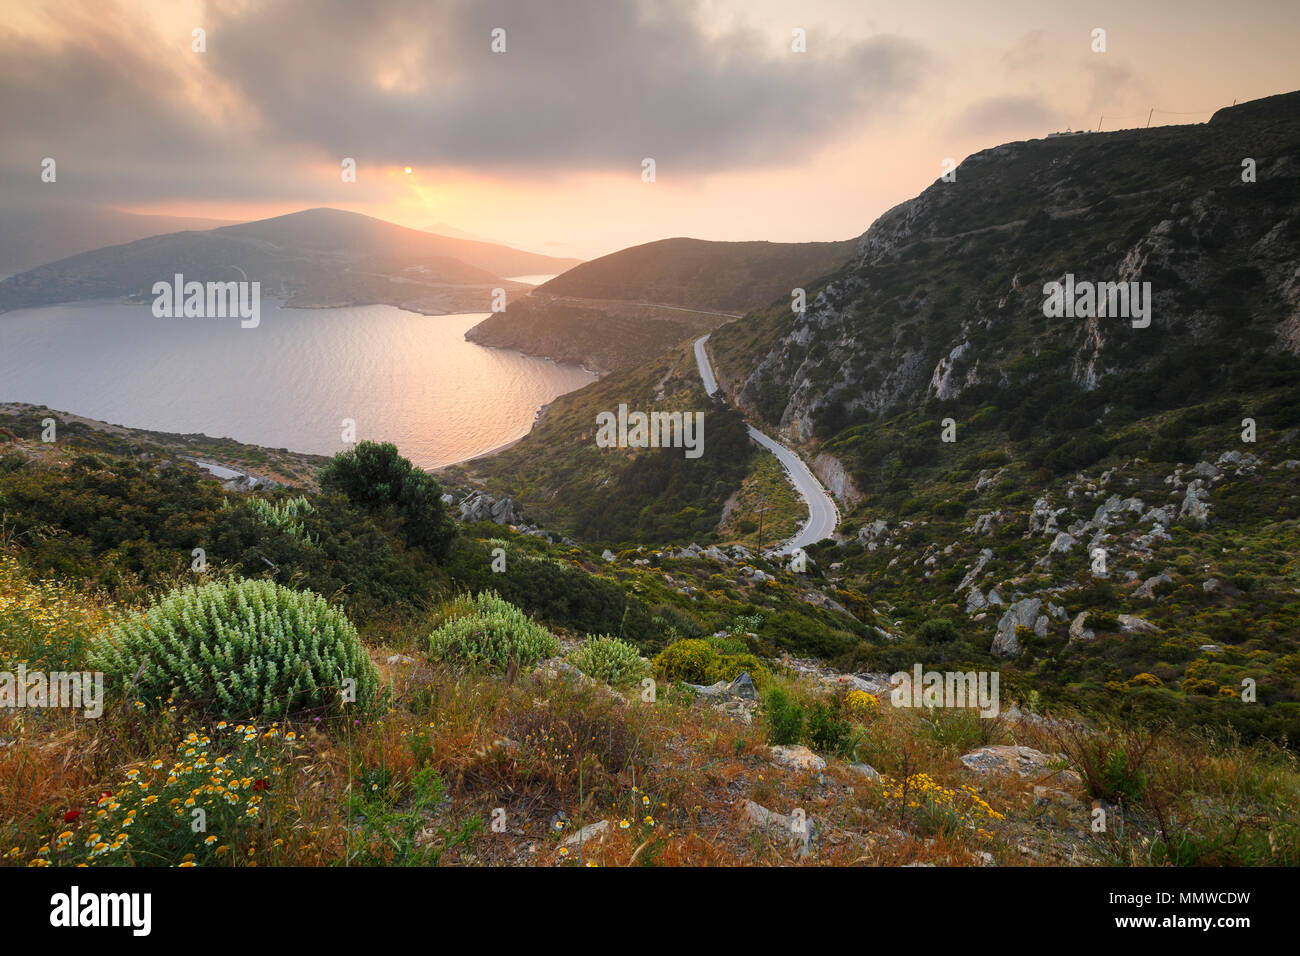 Moody morning view of the Fourni coastline, Greece. - Stock Image